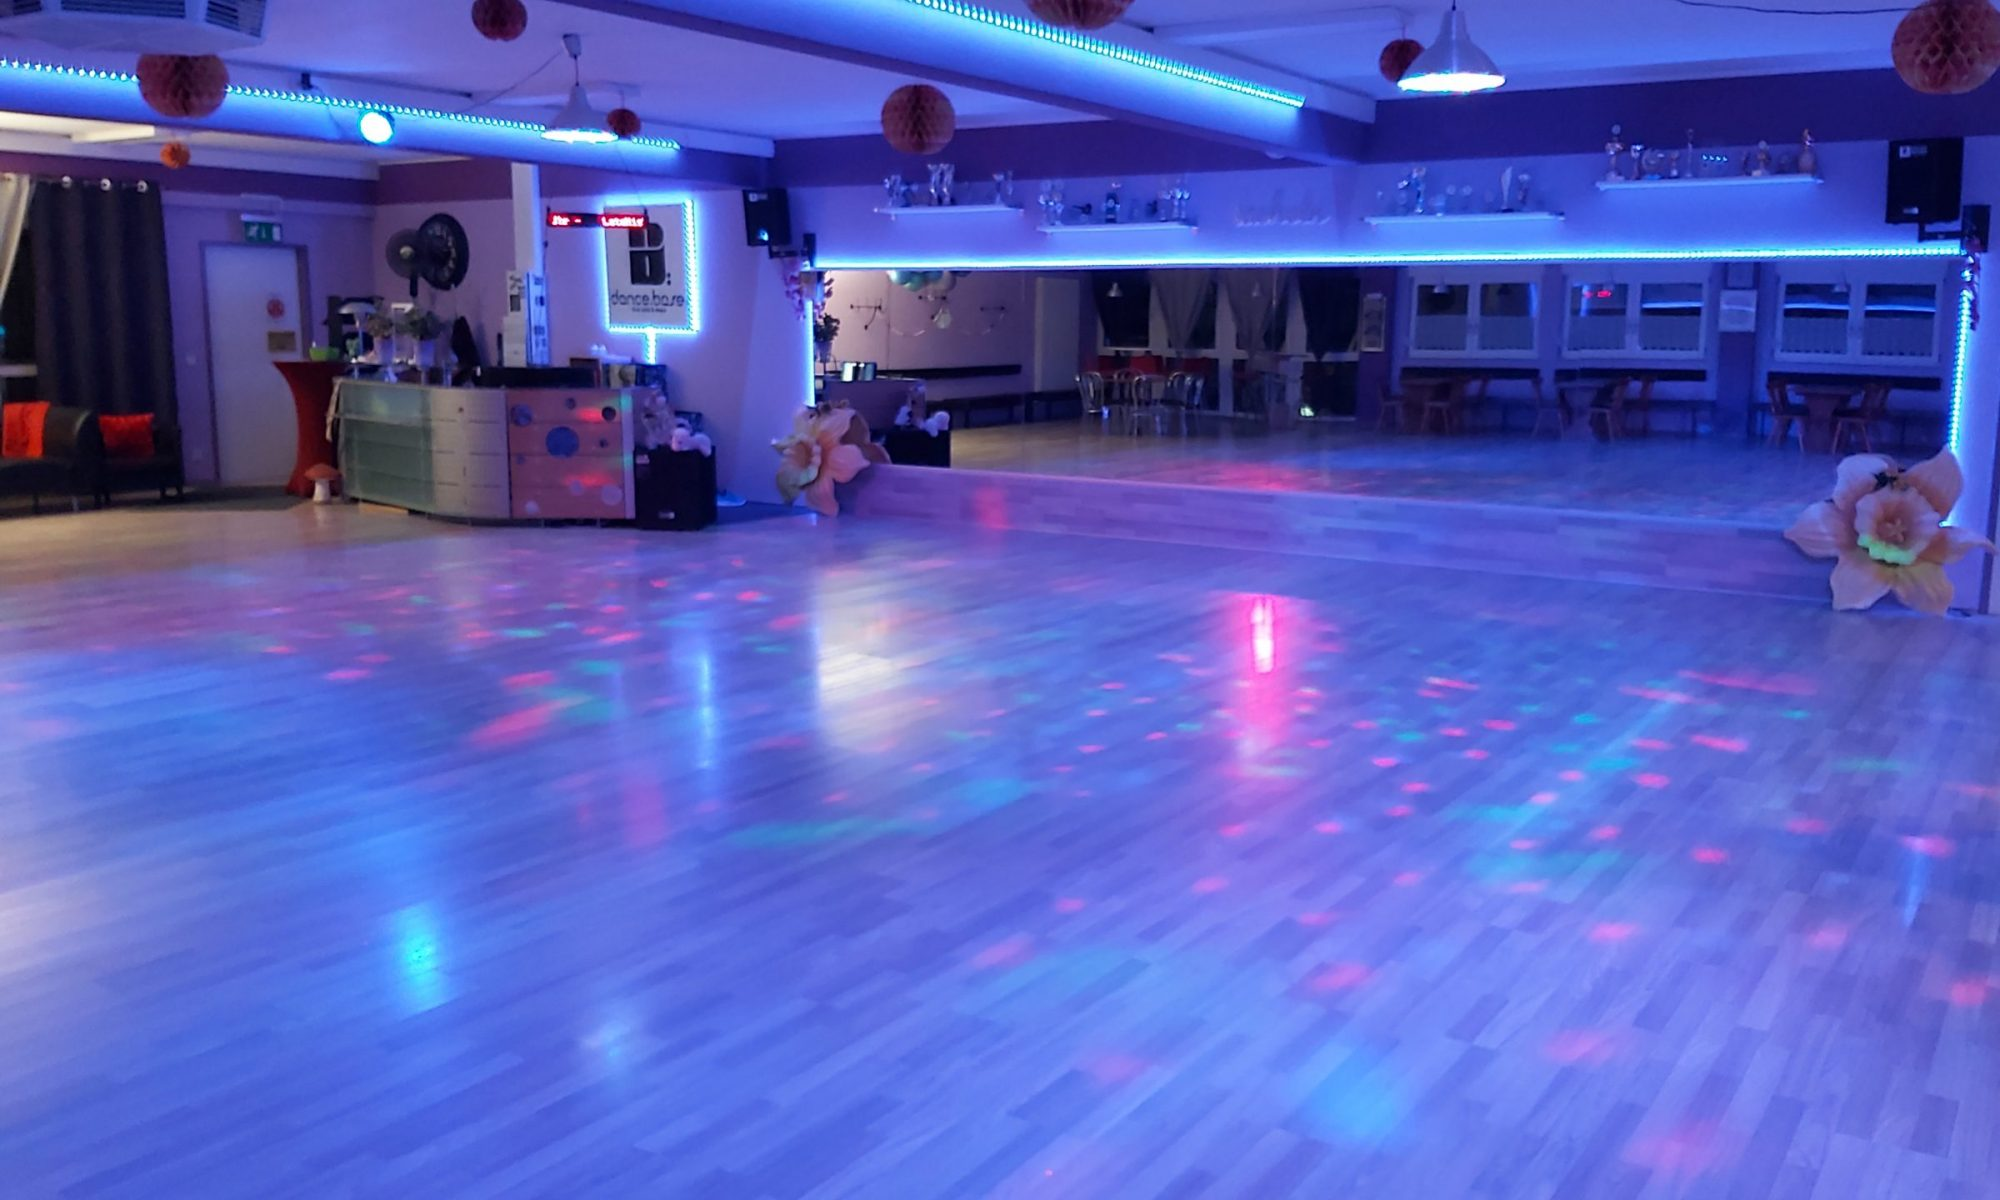 Tanzstudio dance base Fuerth